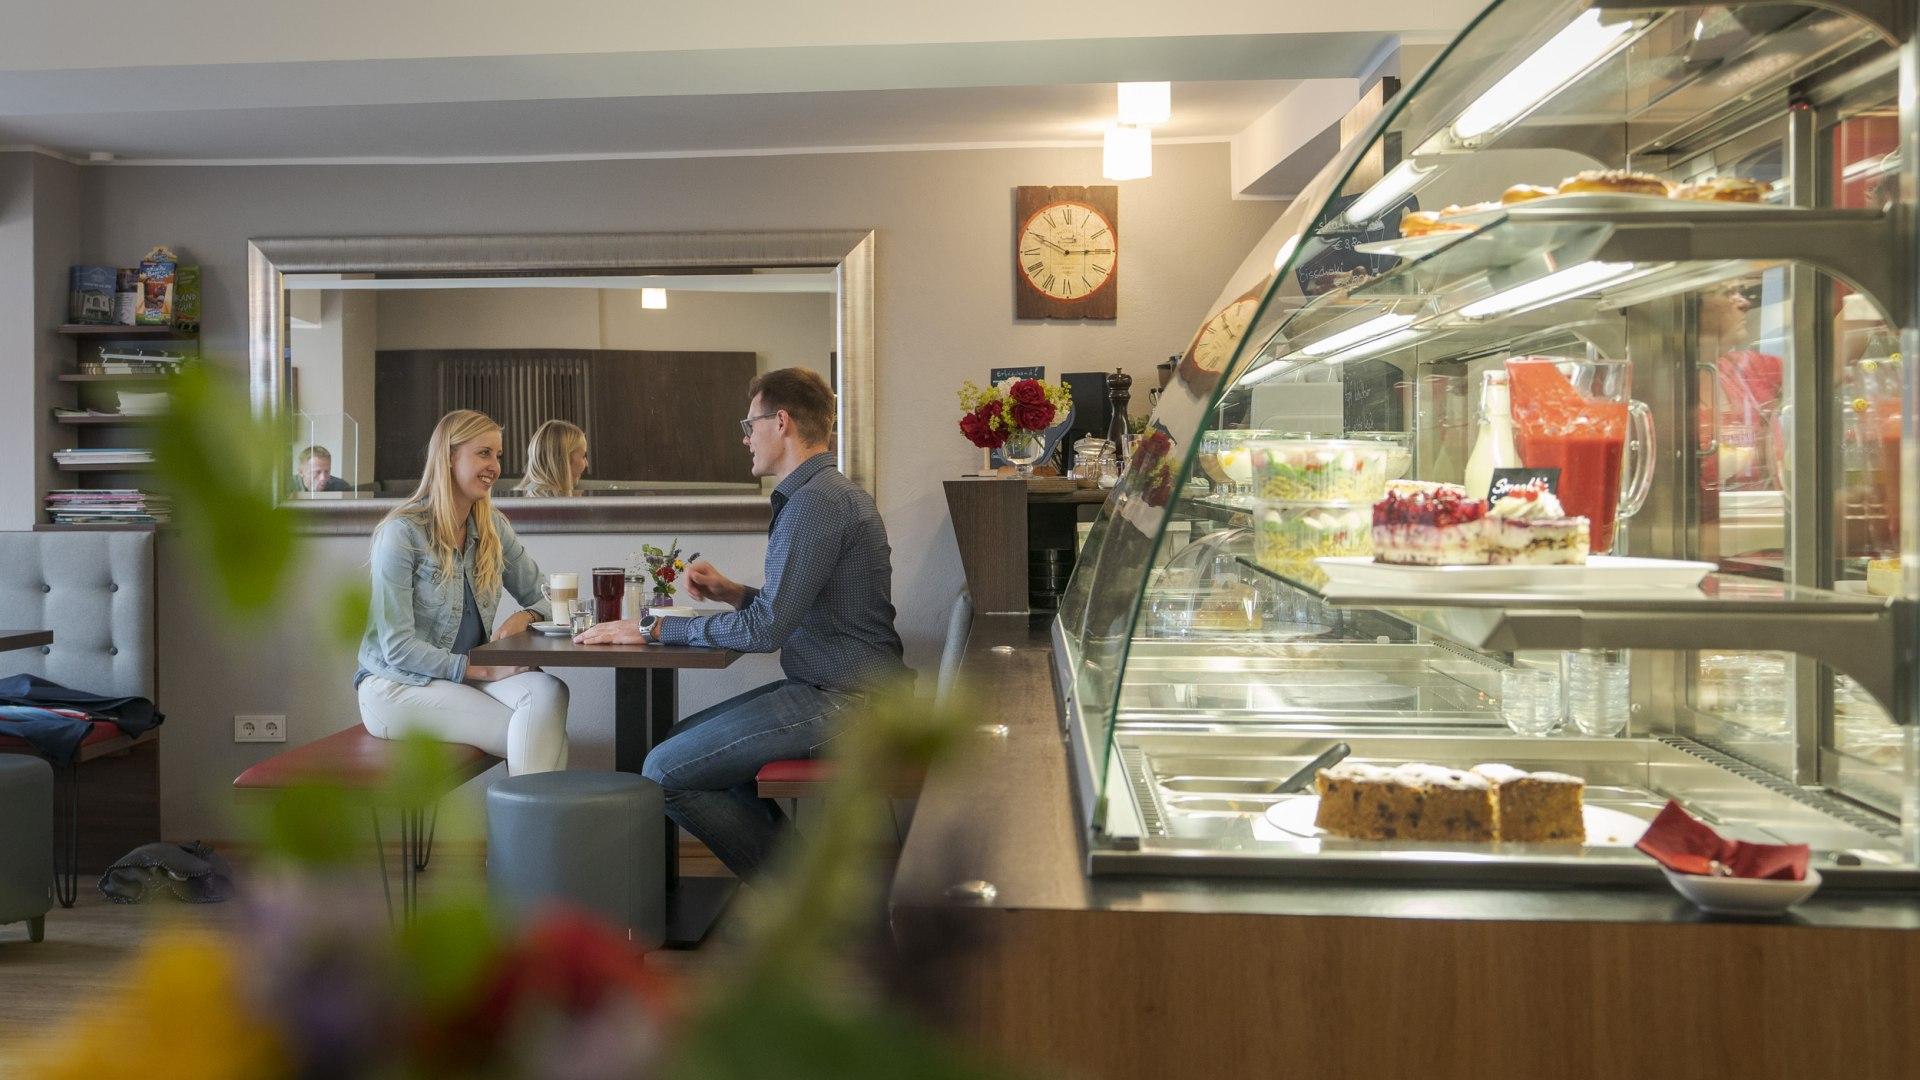 Das Café Huatfabrik von innen, © Dietmar Denger